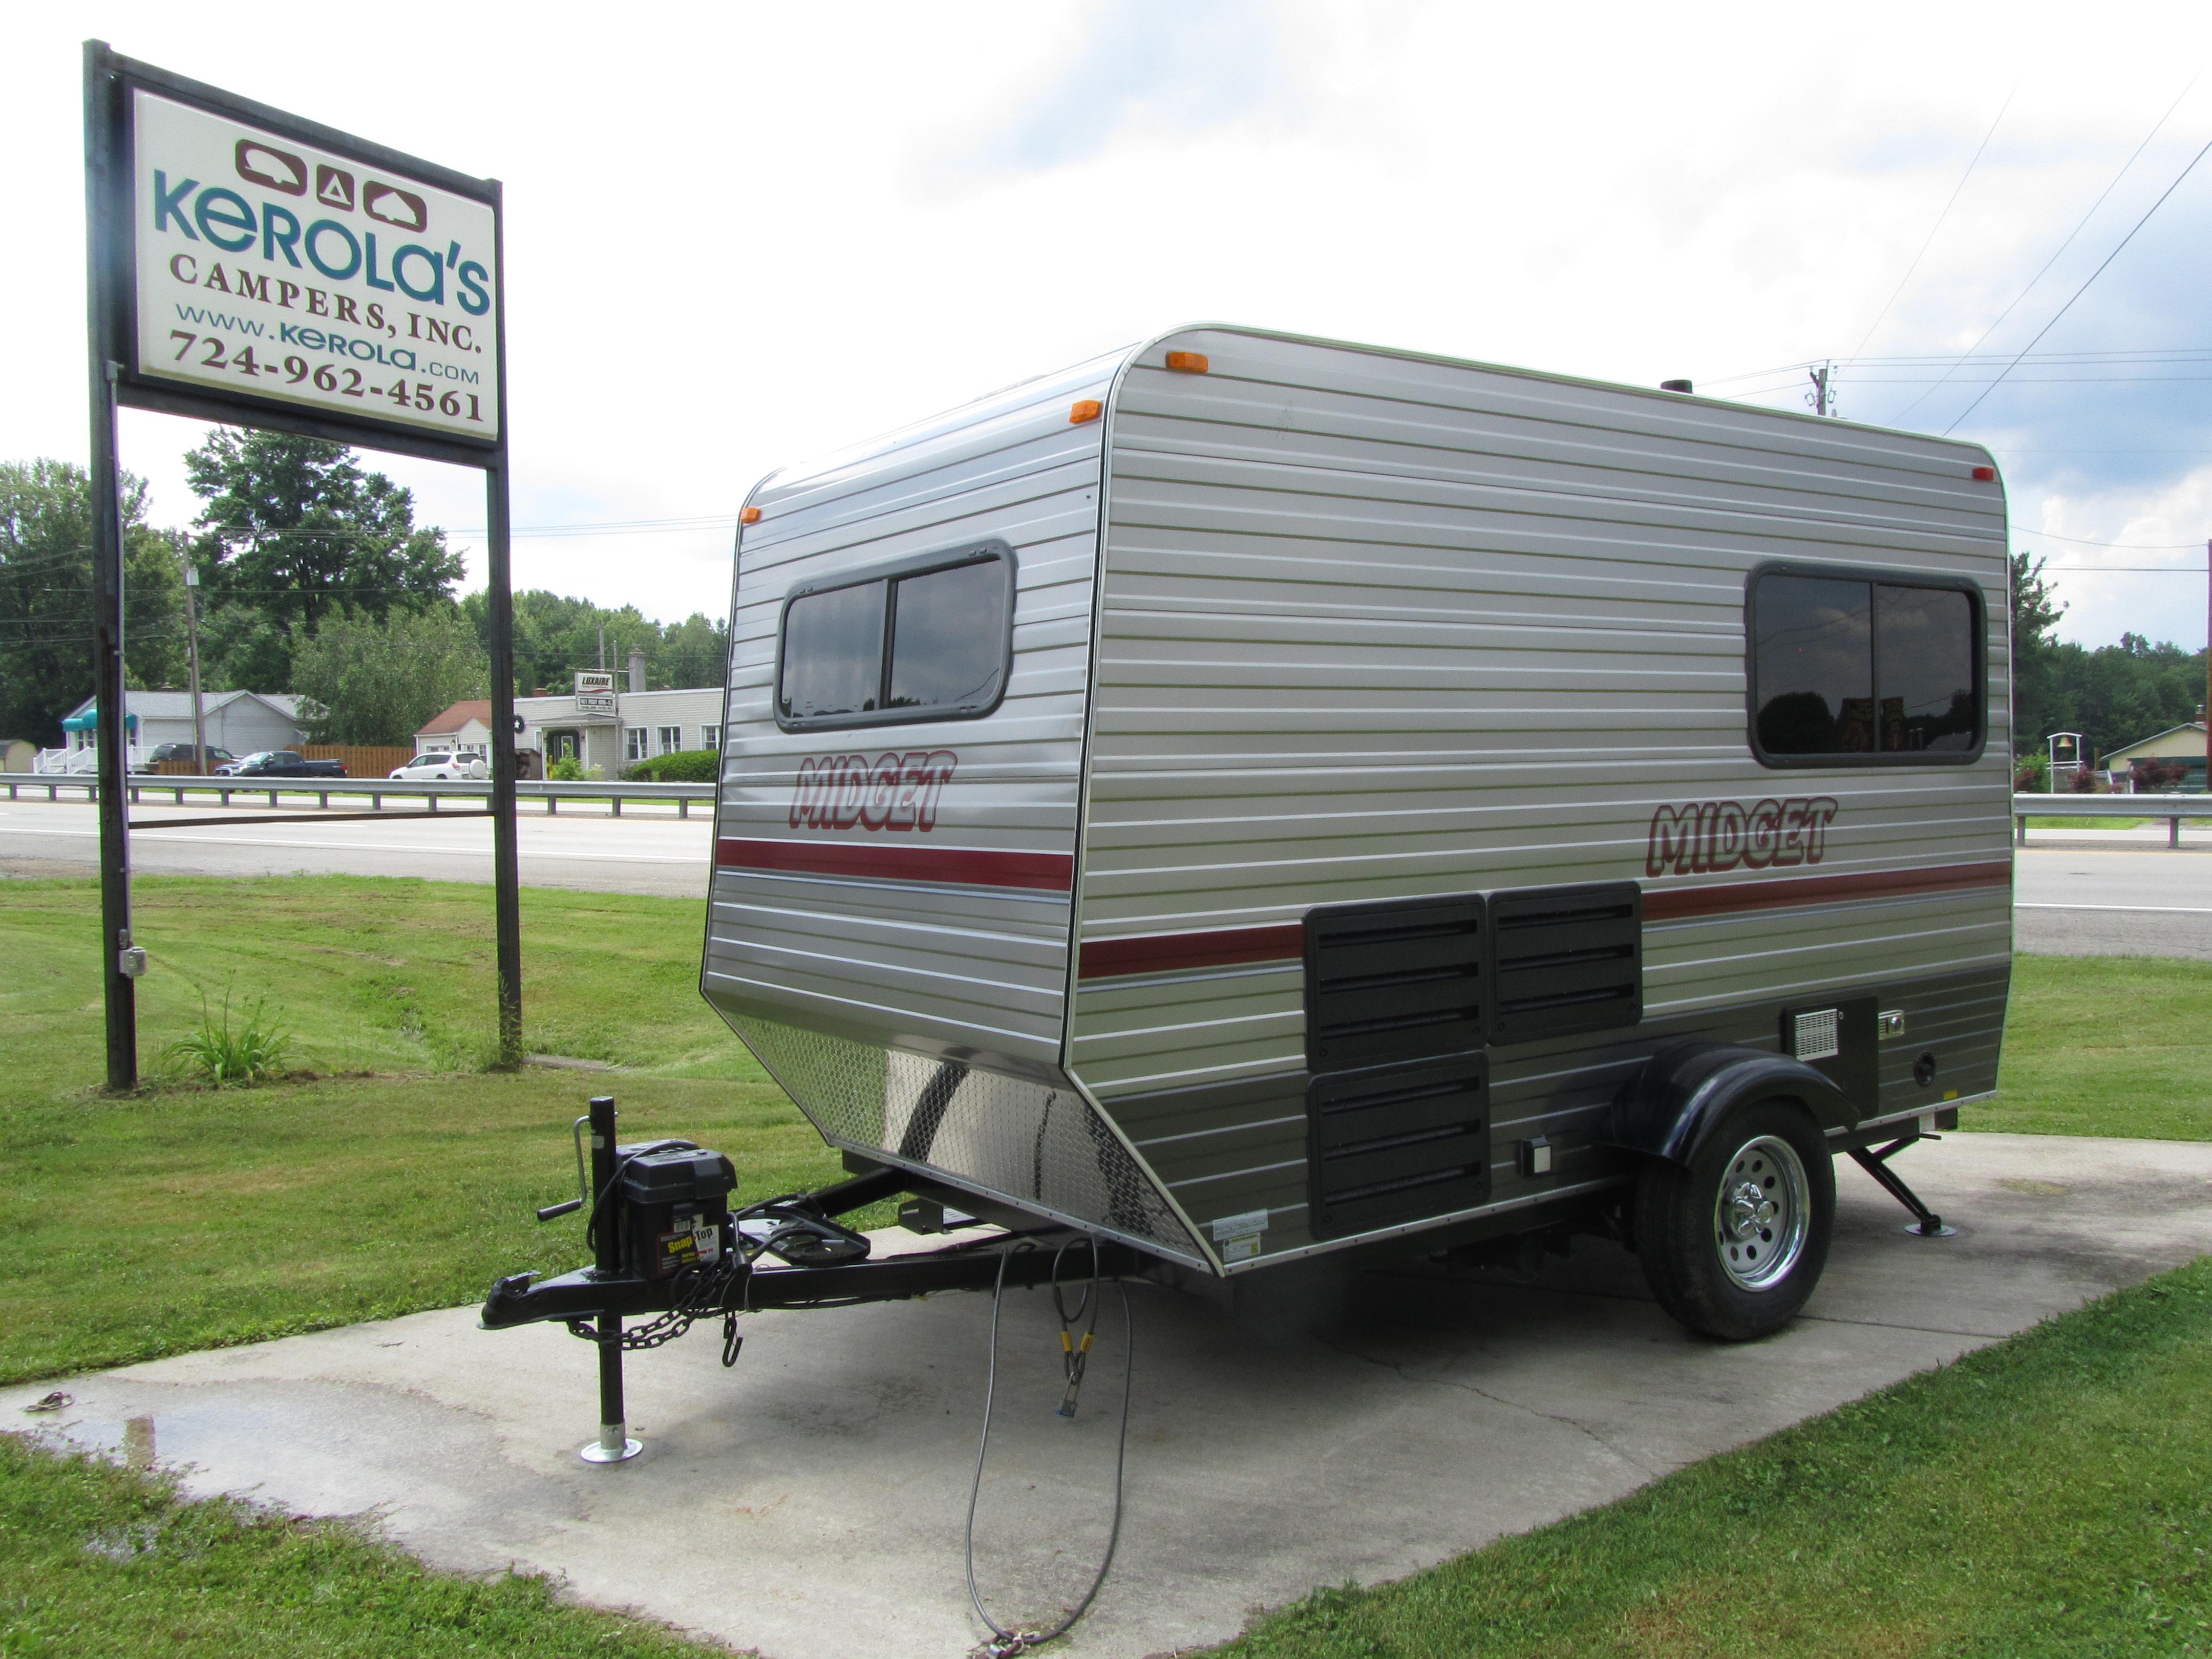 Build midget trailer confirm